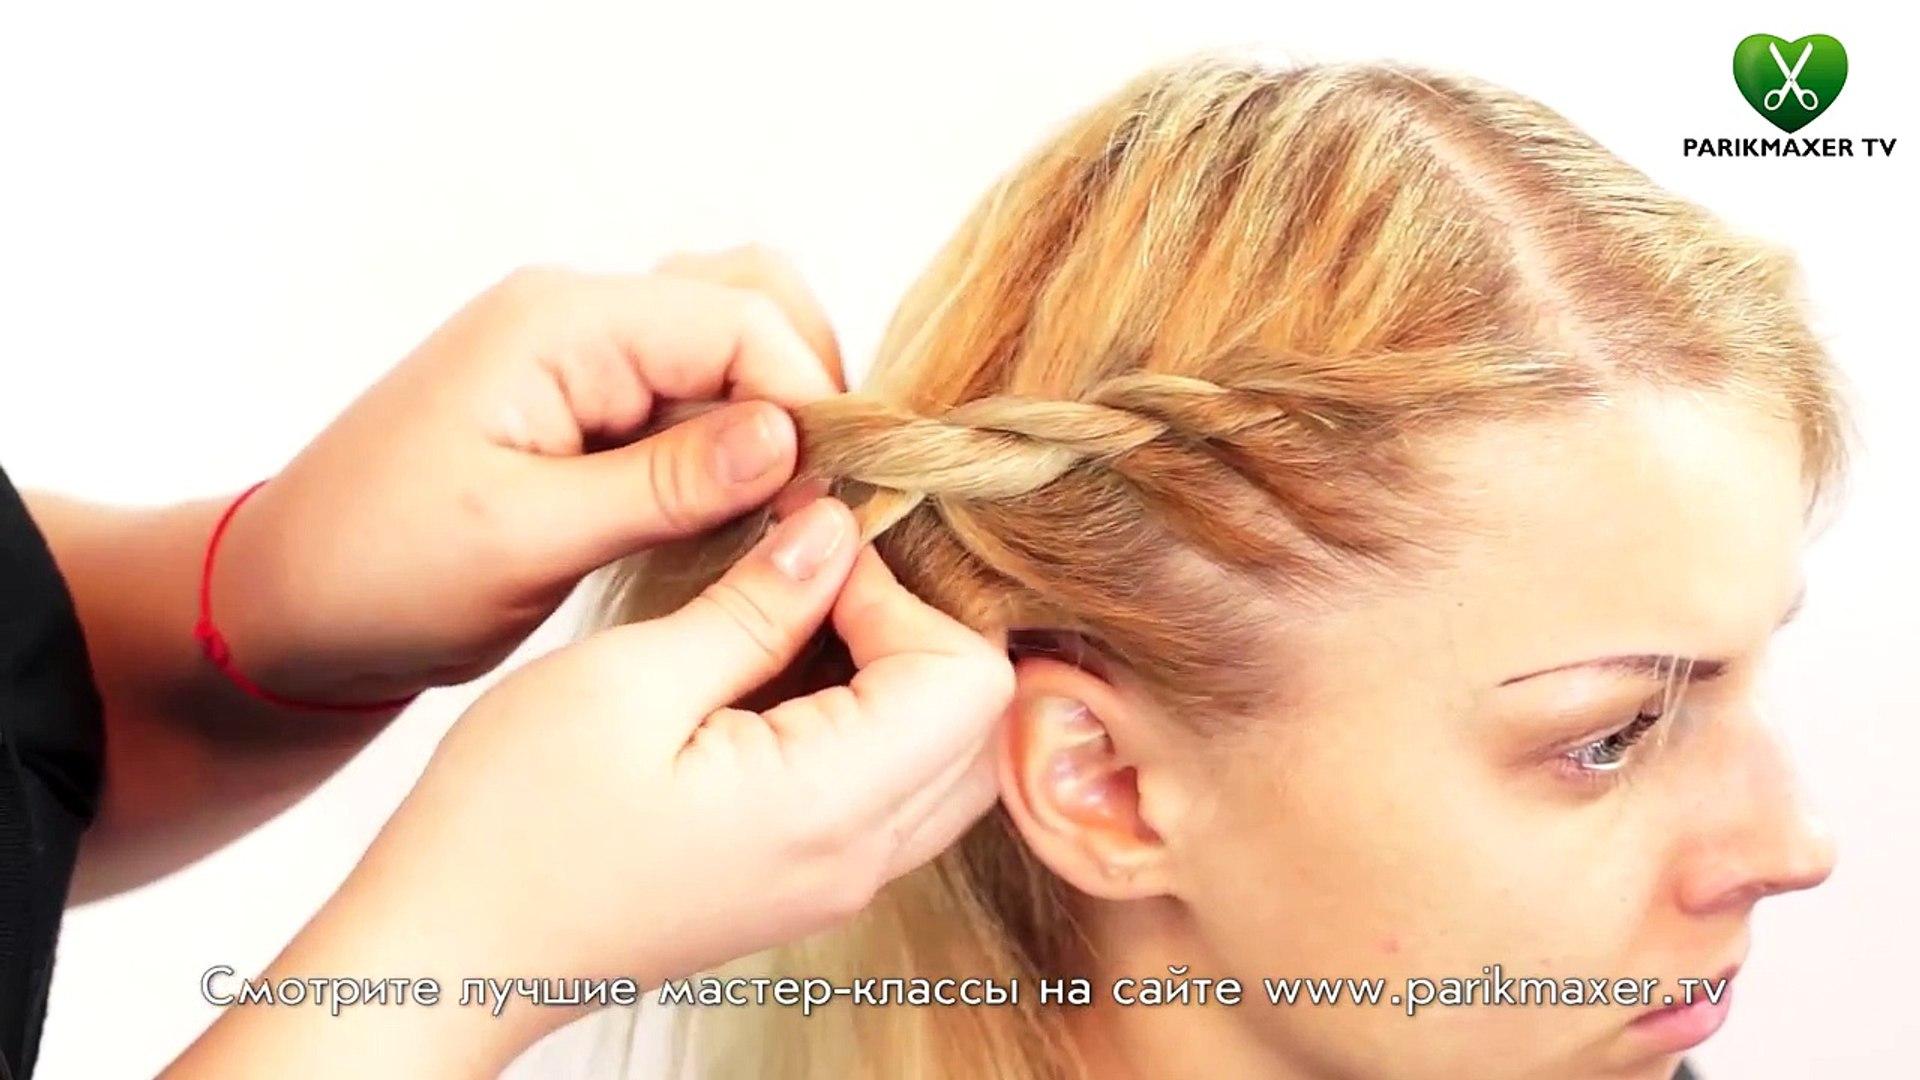 Простая прическа с плетением Simple twisted hairdo парикмахер тв parikmaxer.tv peluquero tv